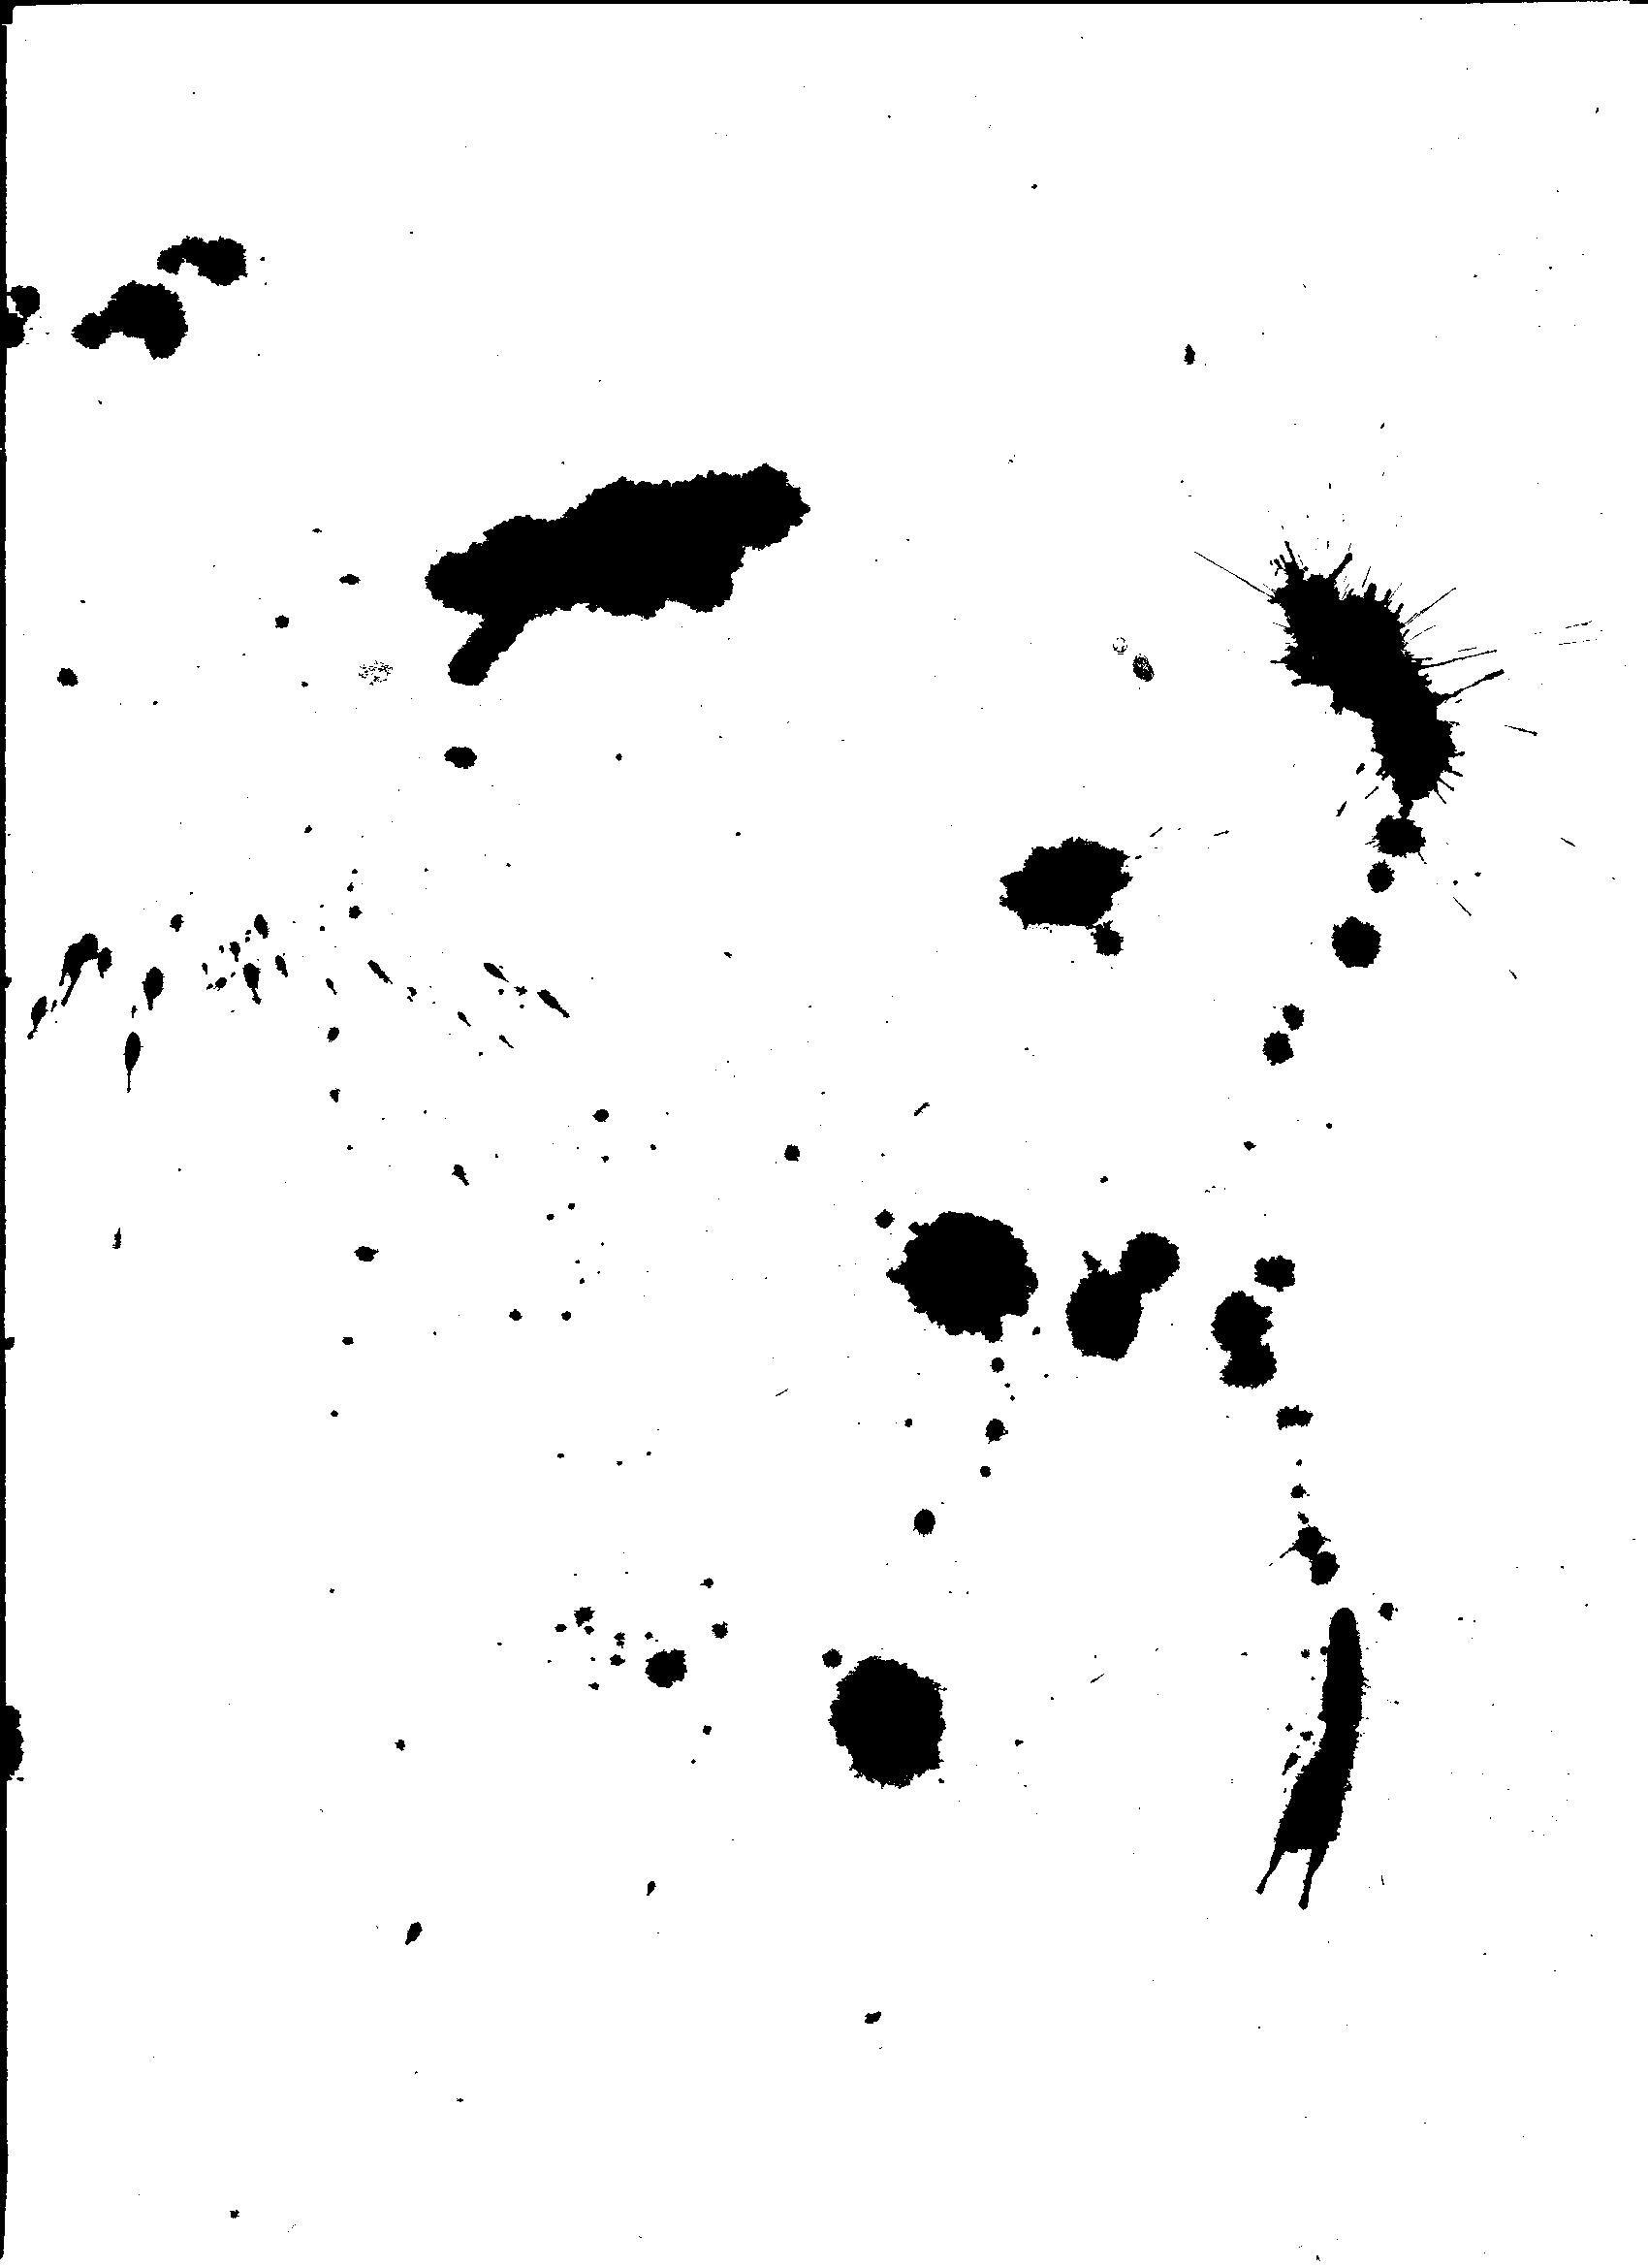 Paint Splatter Png Google Search